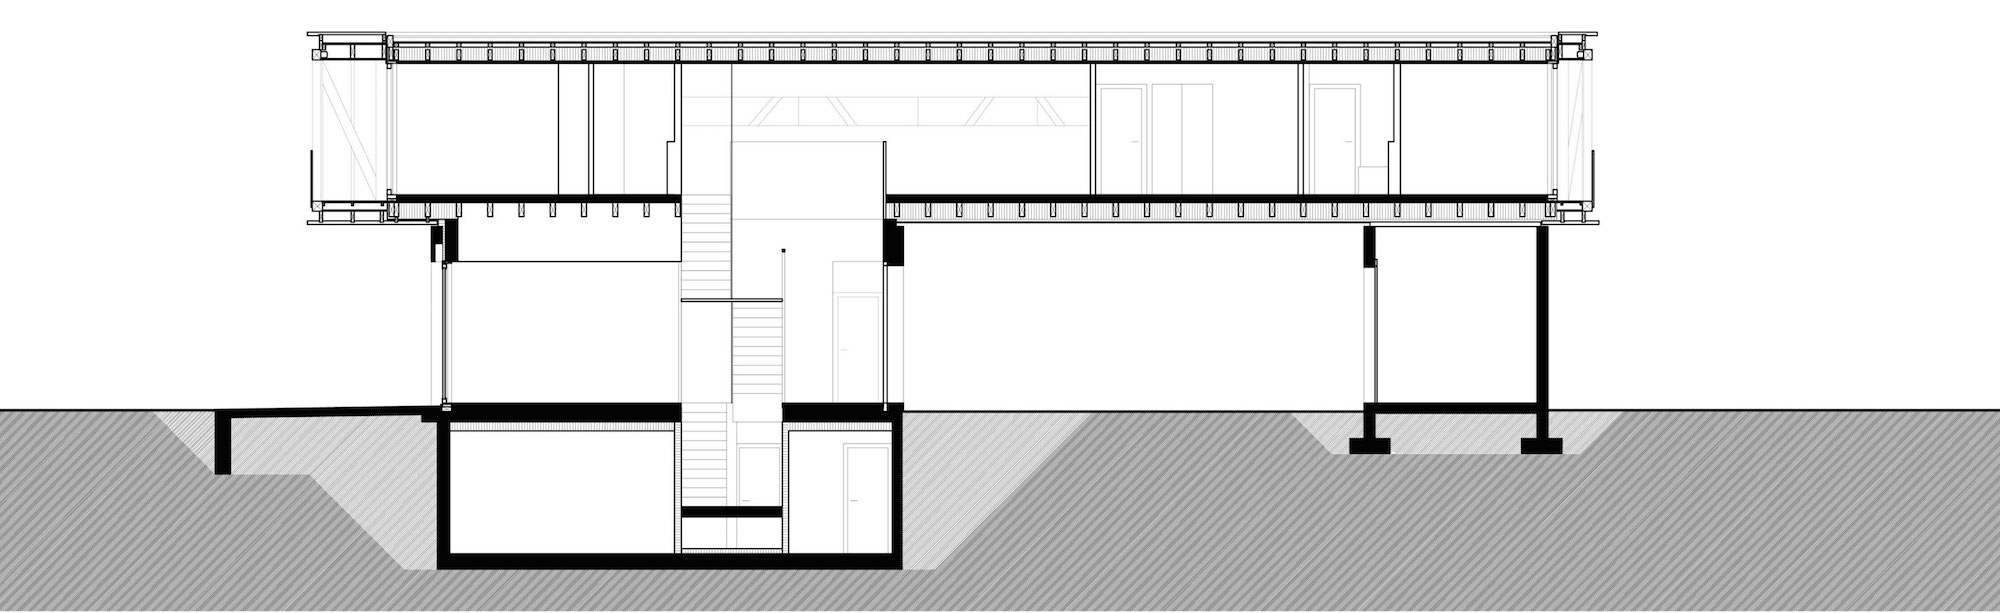 Minergie Villa Christian von Düring architecte-31